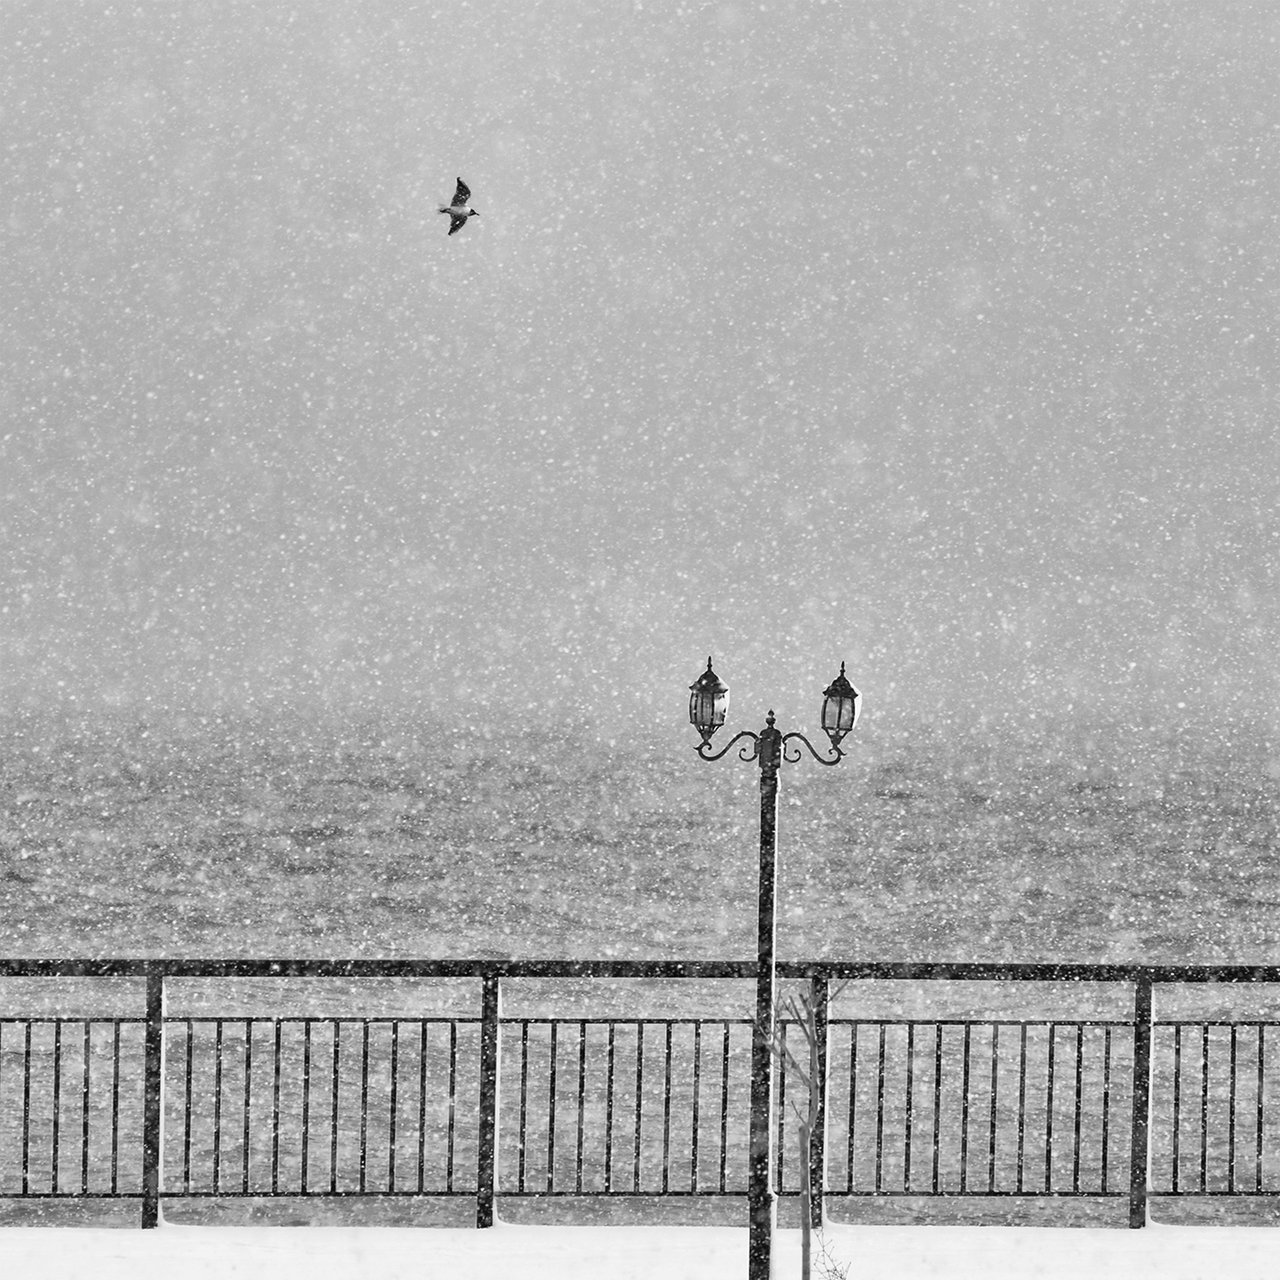 Photo in Nature | Author Mladen Parvanov - demiman | PHOTO FORUM